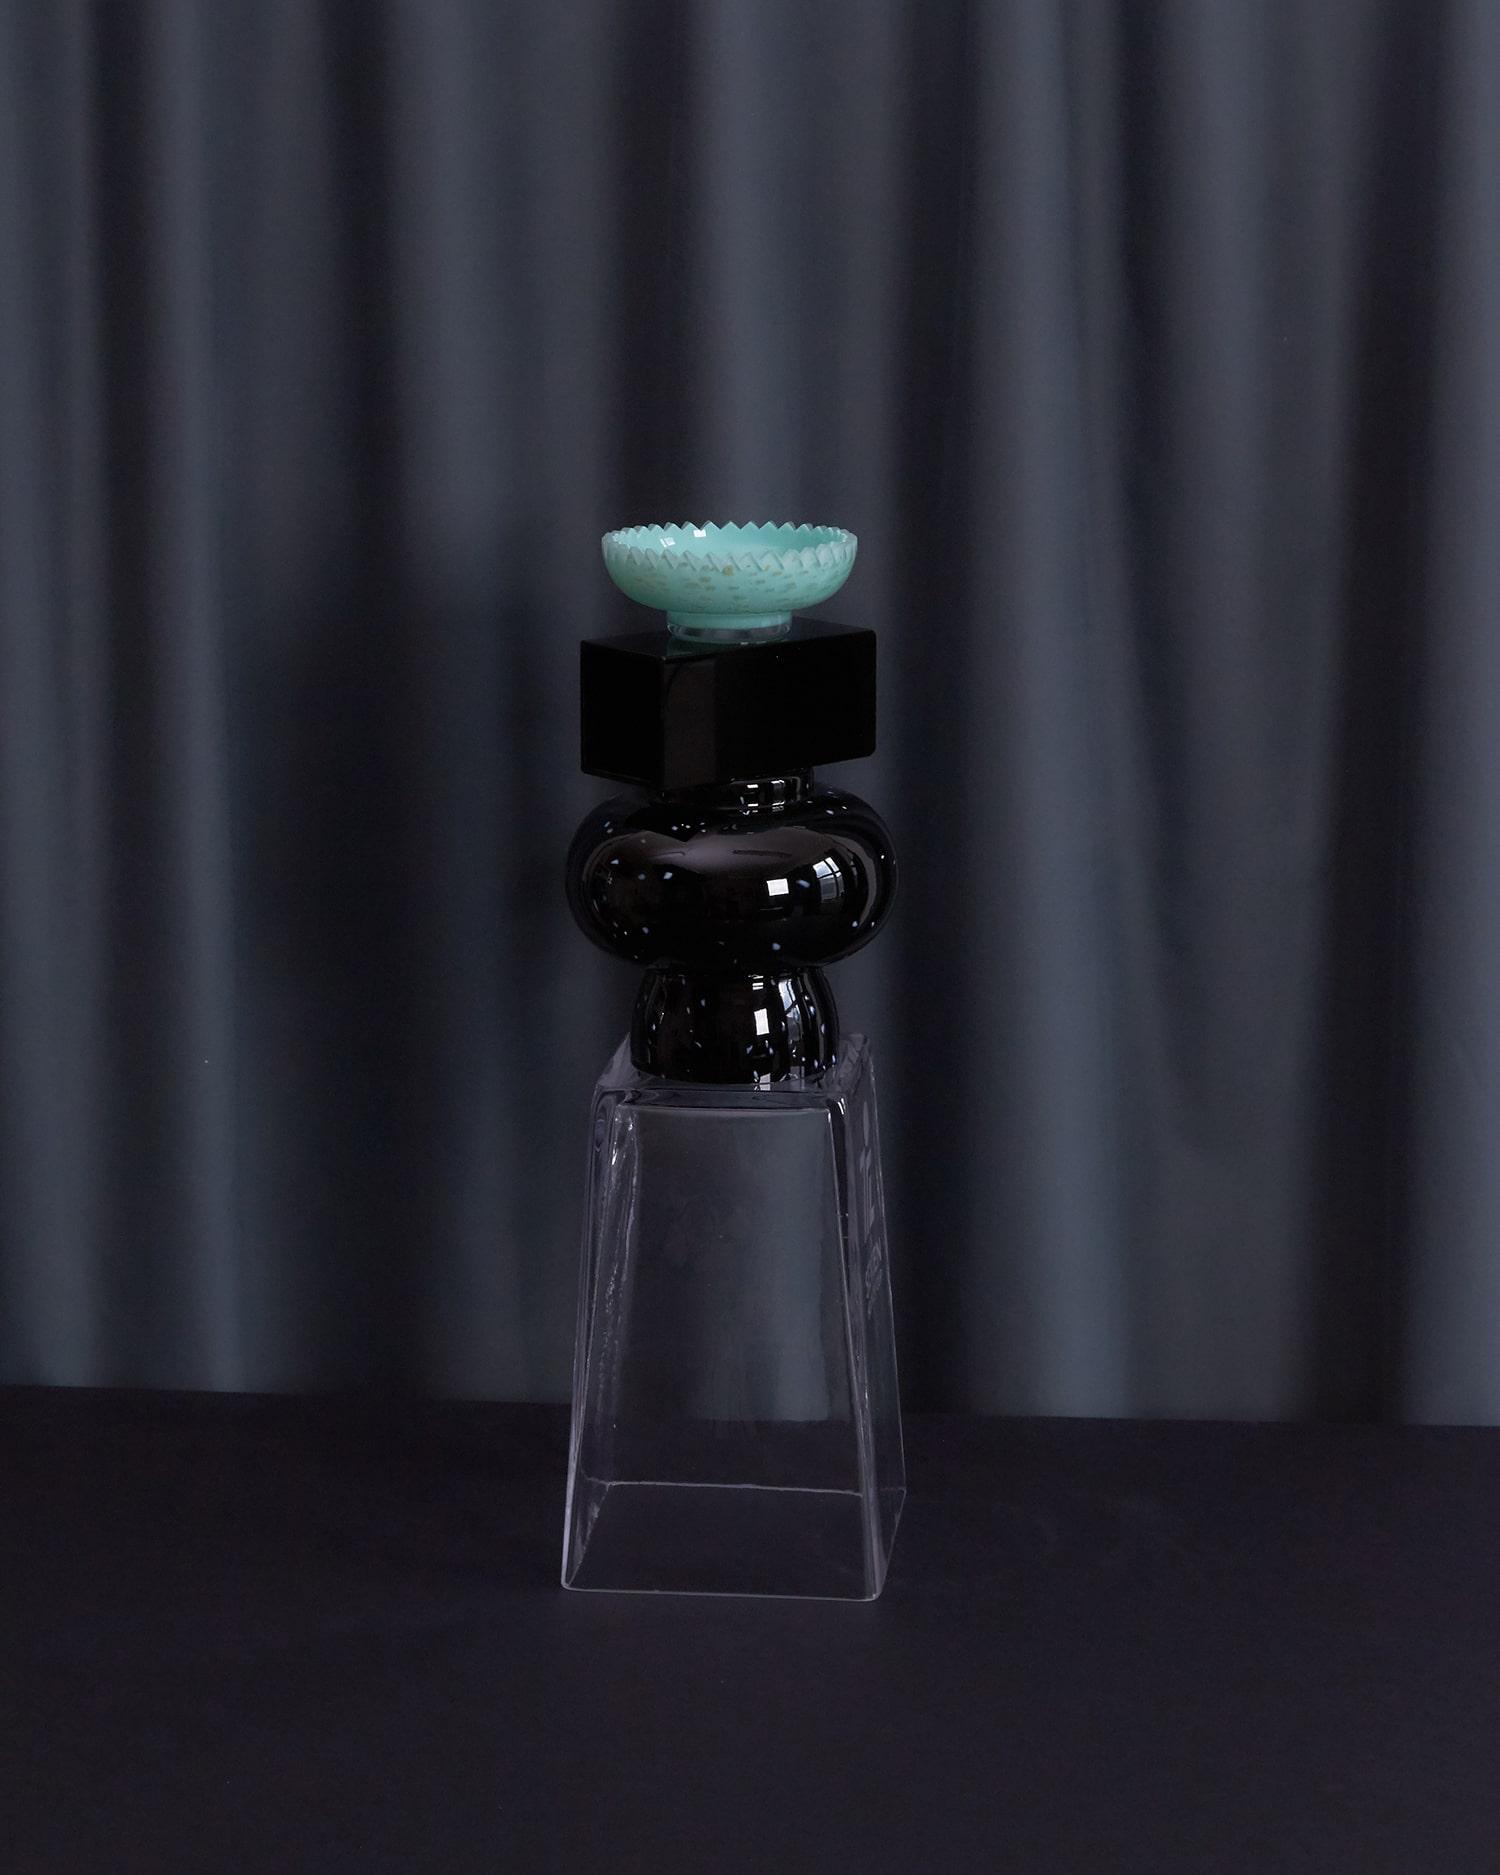 the winner trophy hockey challenge cup glass object hokej pohar trofej sklo objekt vyrobeno v cechach produced czechrepublic design by jiri krejcirik 4